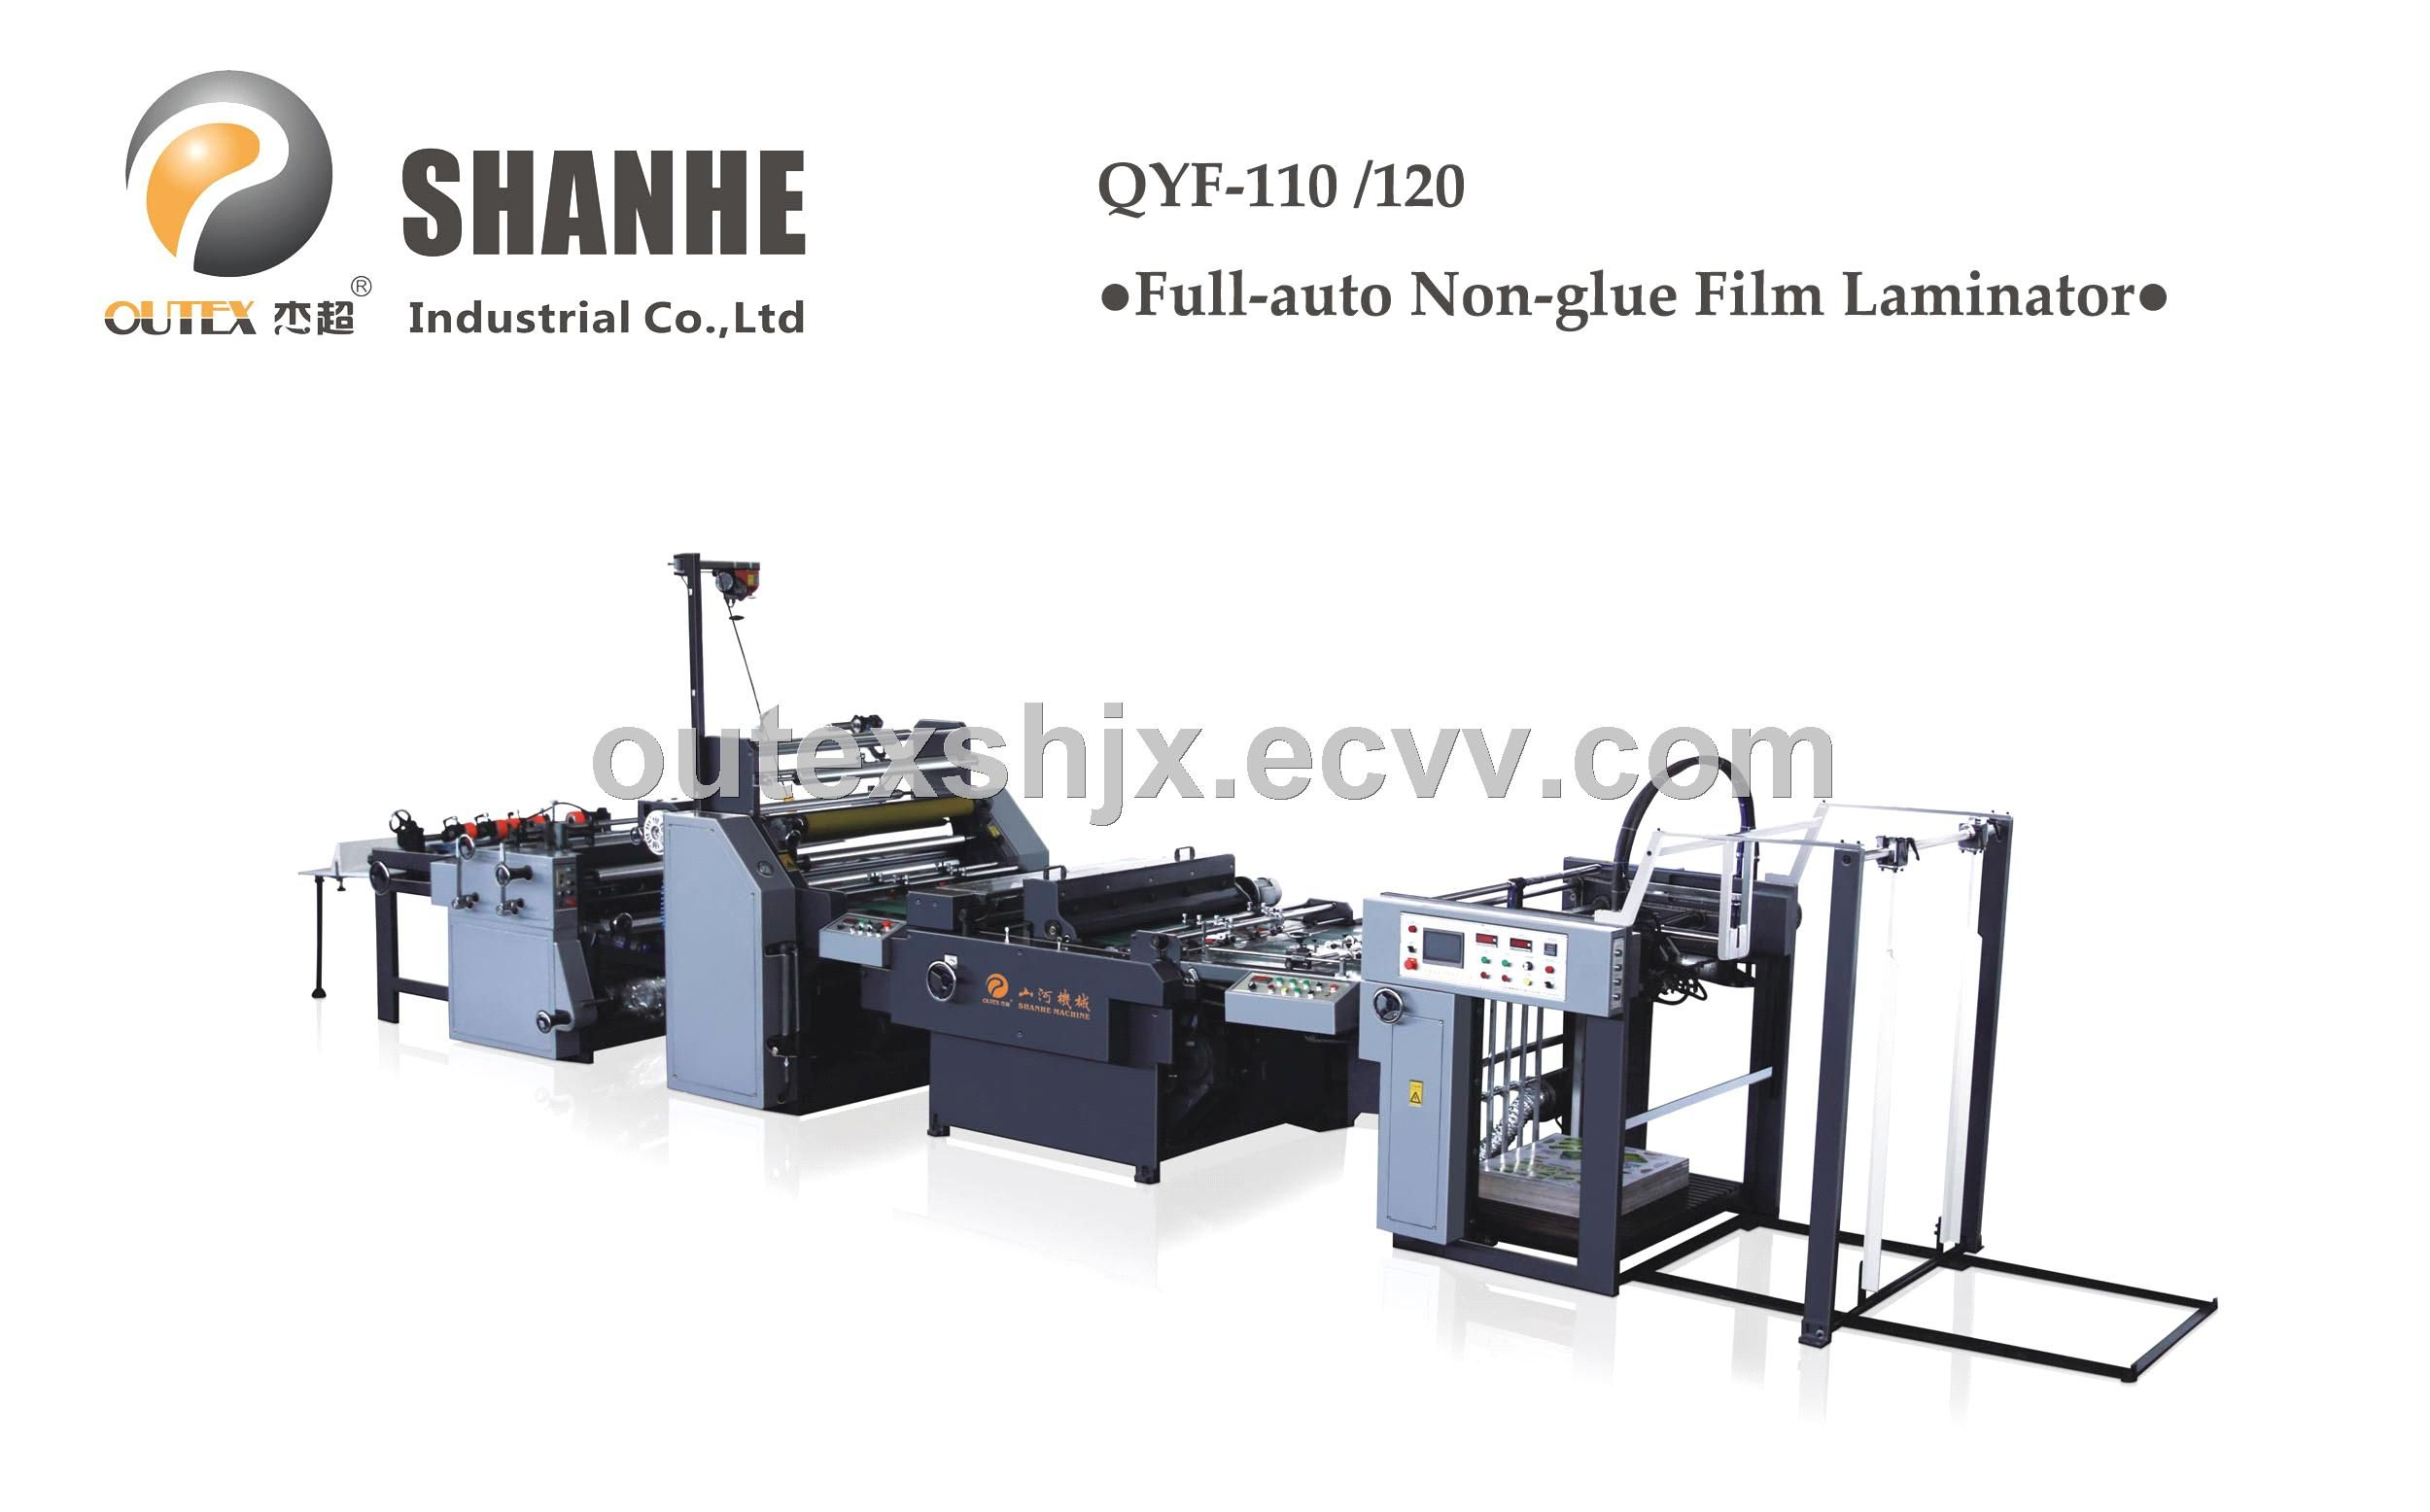 Qyf 110 120 Full Auto Non Glue Film Lamination Machine Qyf 110 120 China Laminator Laminating Machine Lamination Machine Manufacturing Laminators Shantou